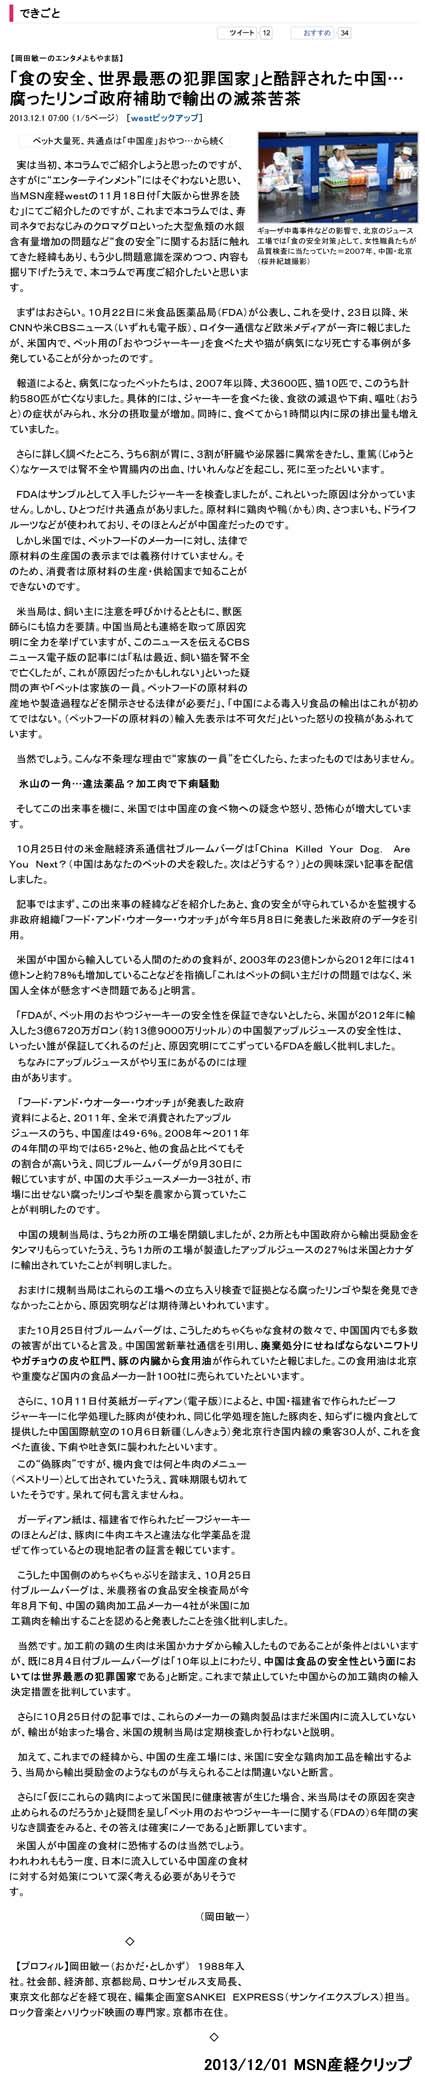 2013/12/01 MSN産経クリップ